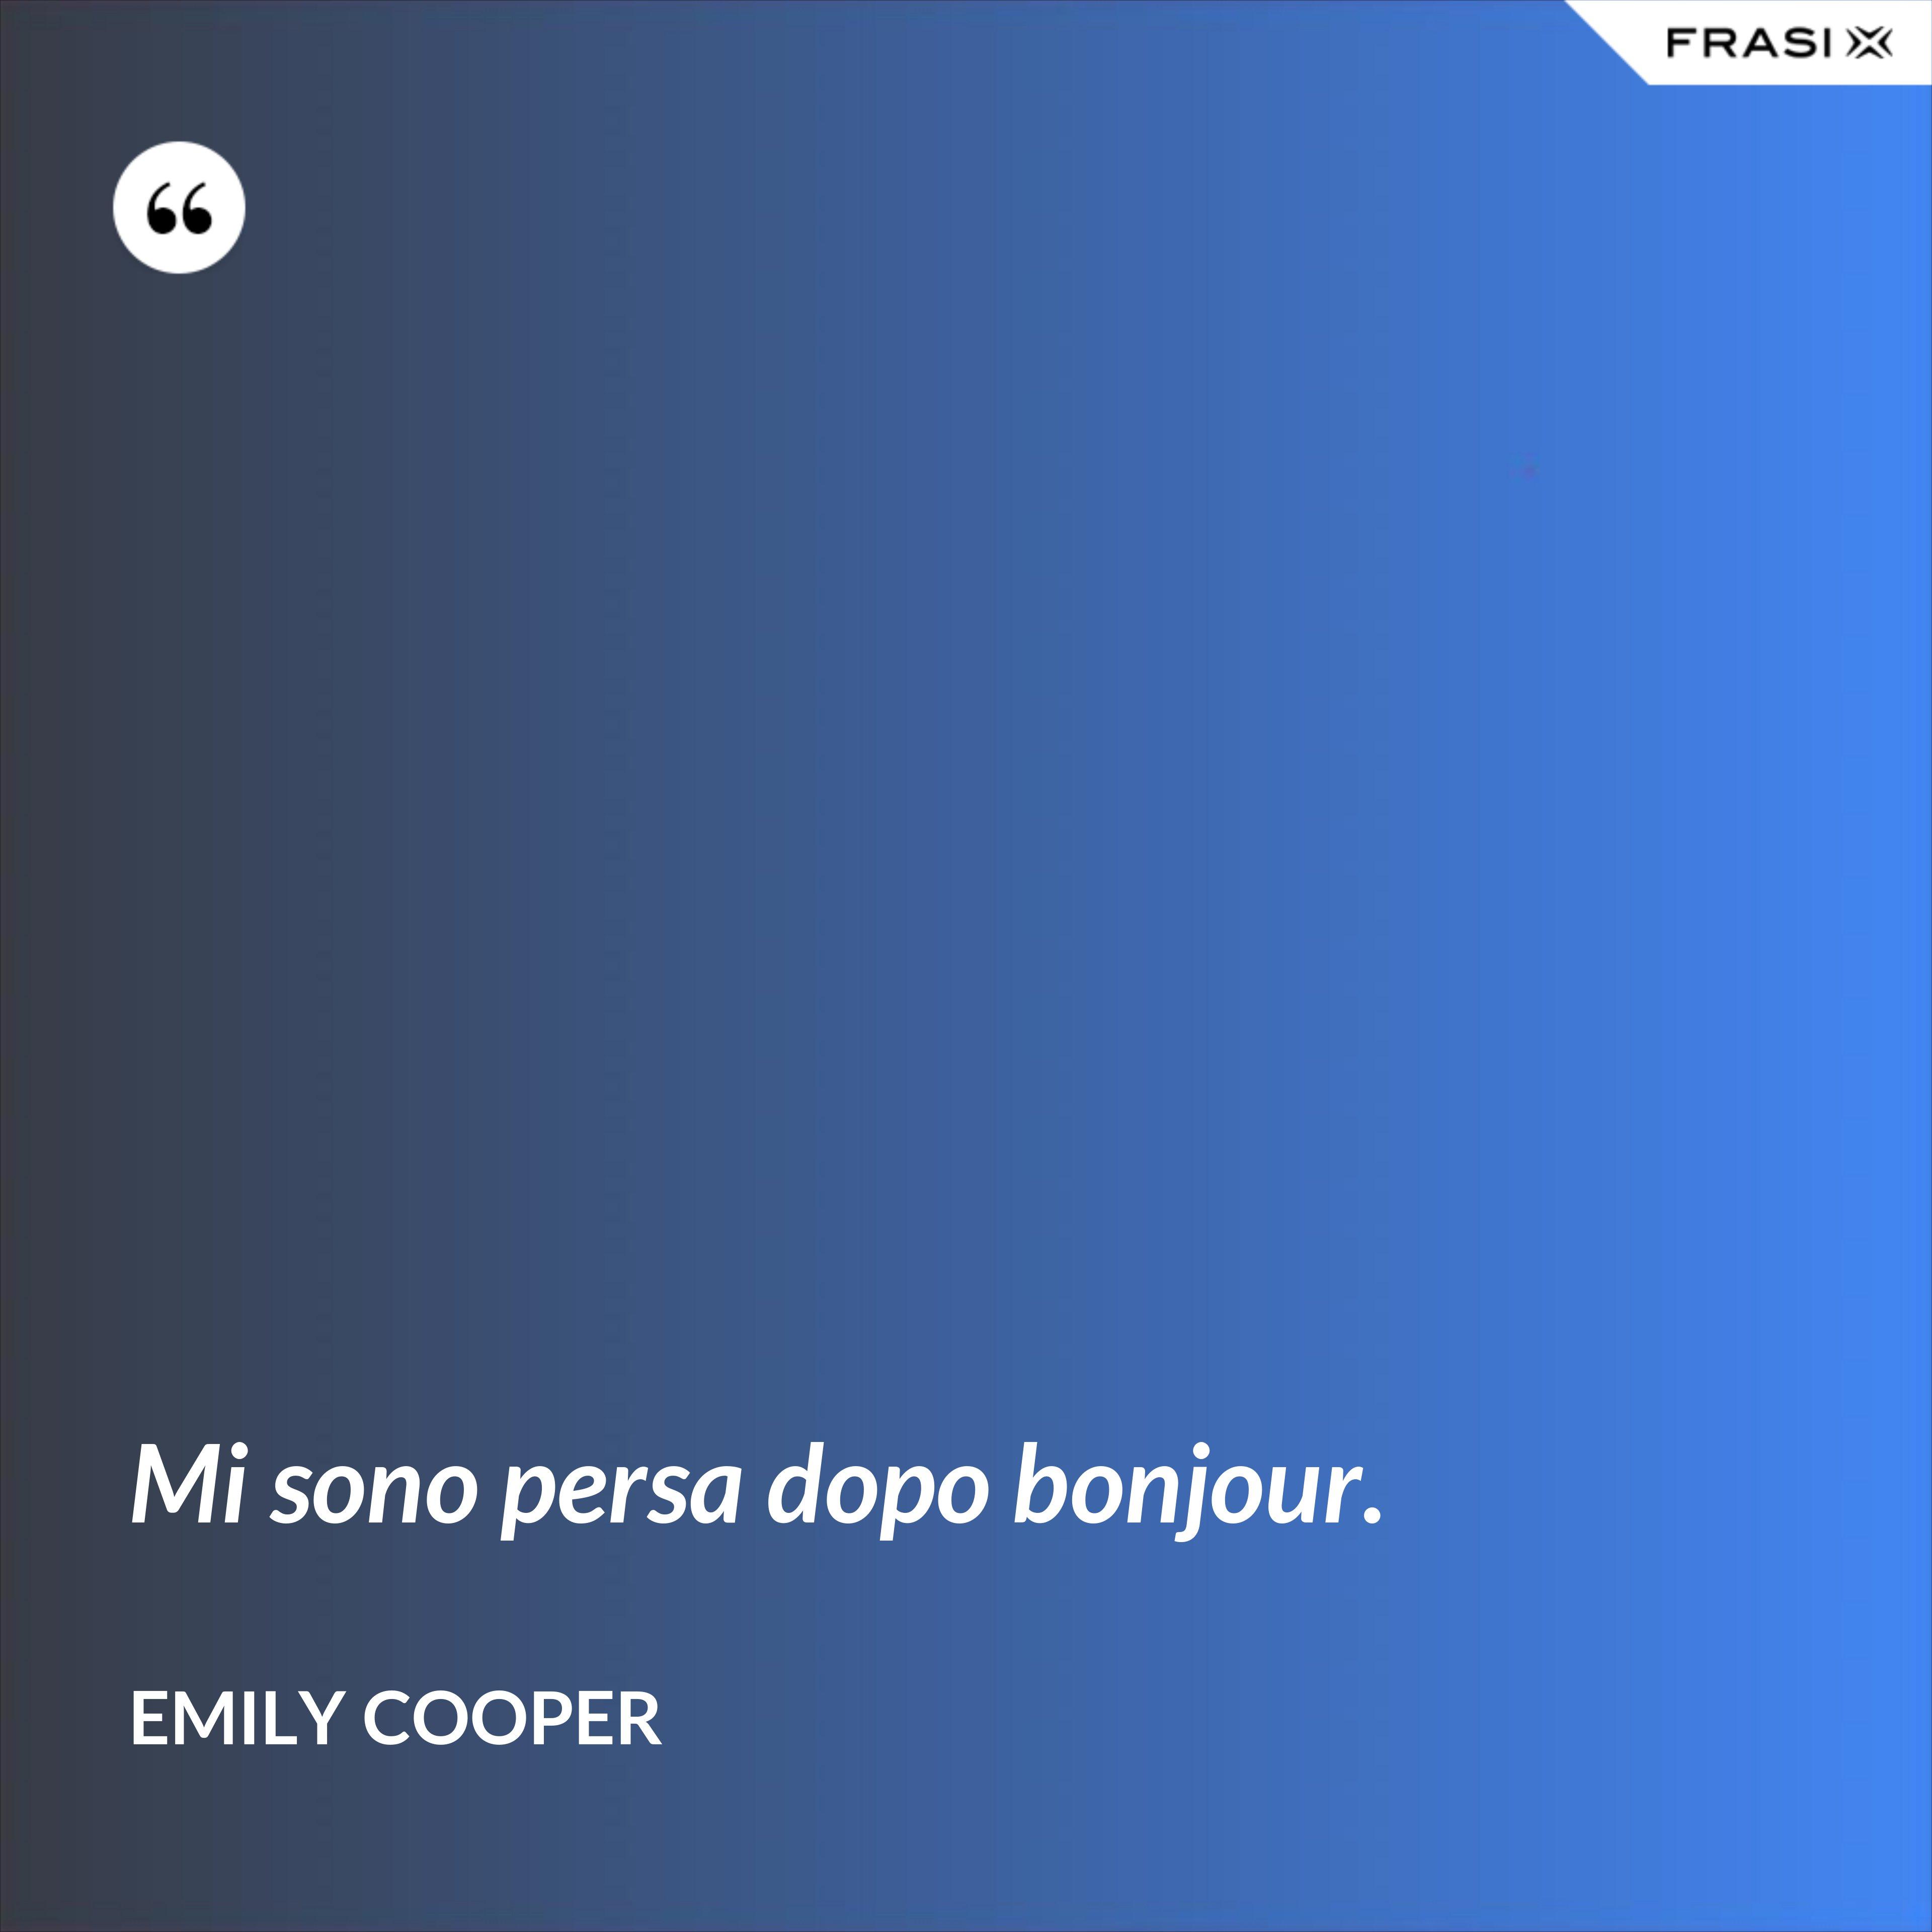 Mi sono persa dopo bonjour. - Emily Cooper